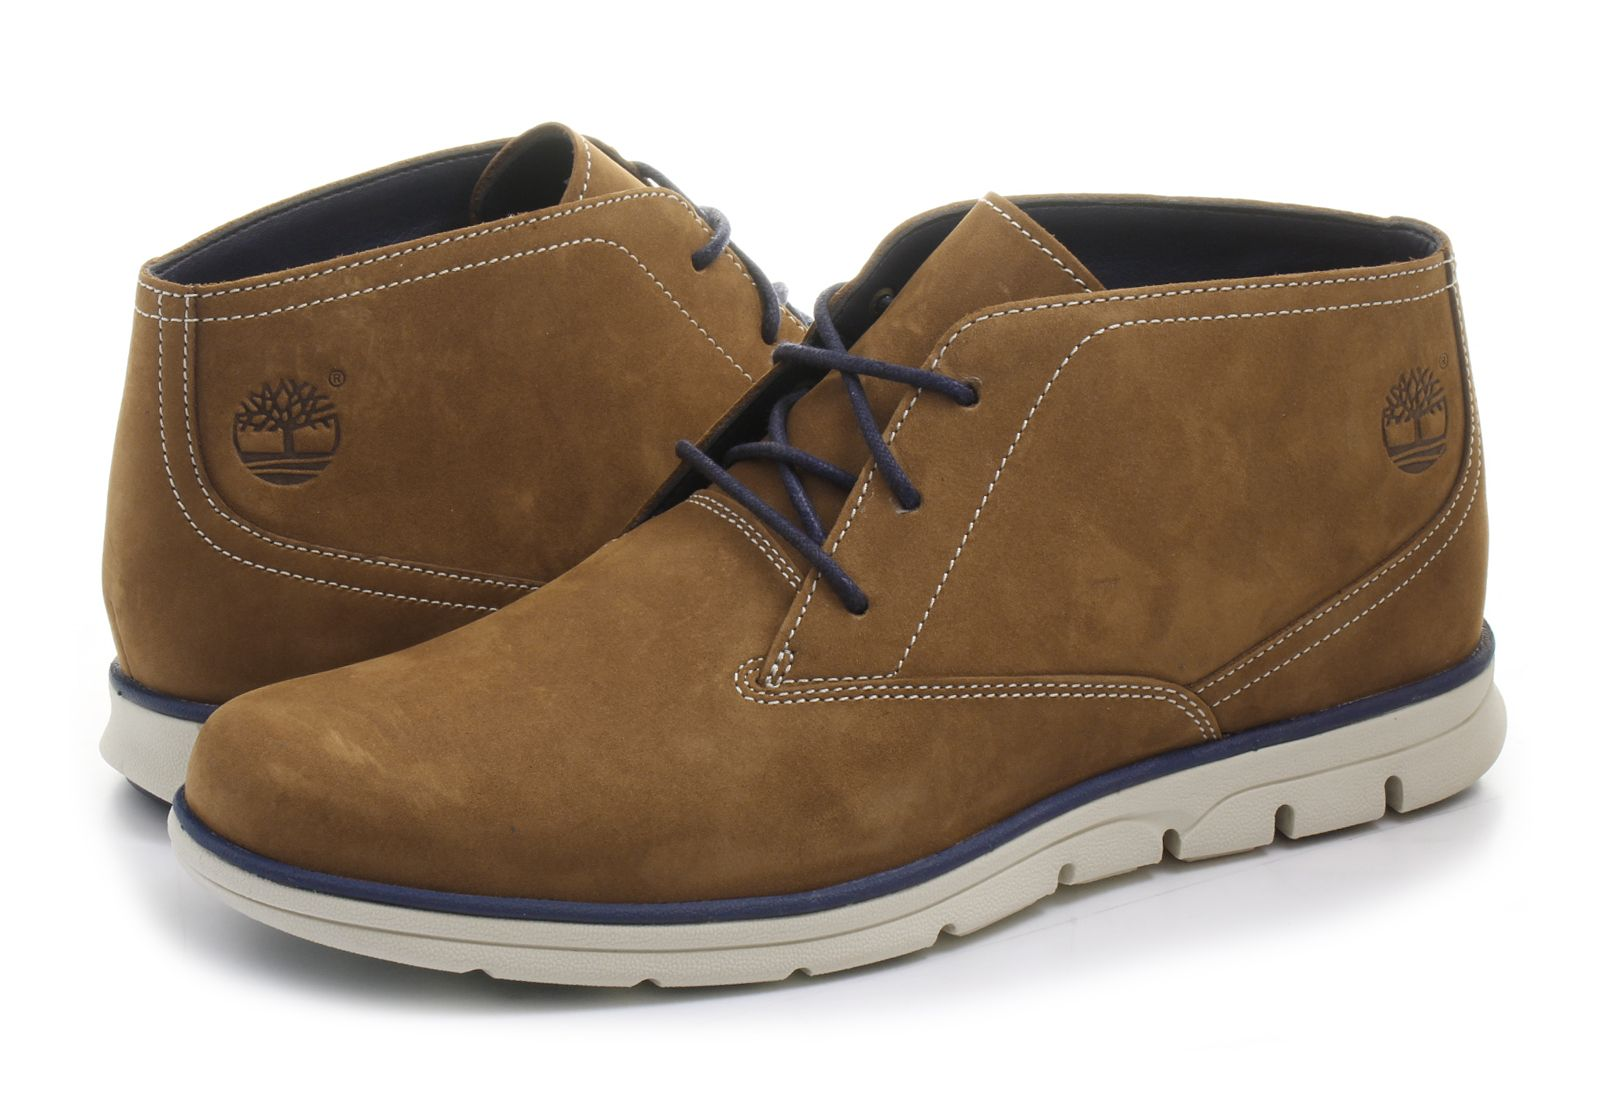 Timberland Shoes - Bradstreet Chukka - A1KIW-brn